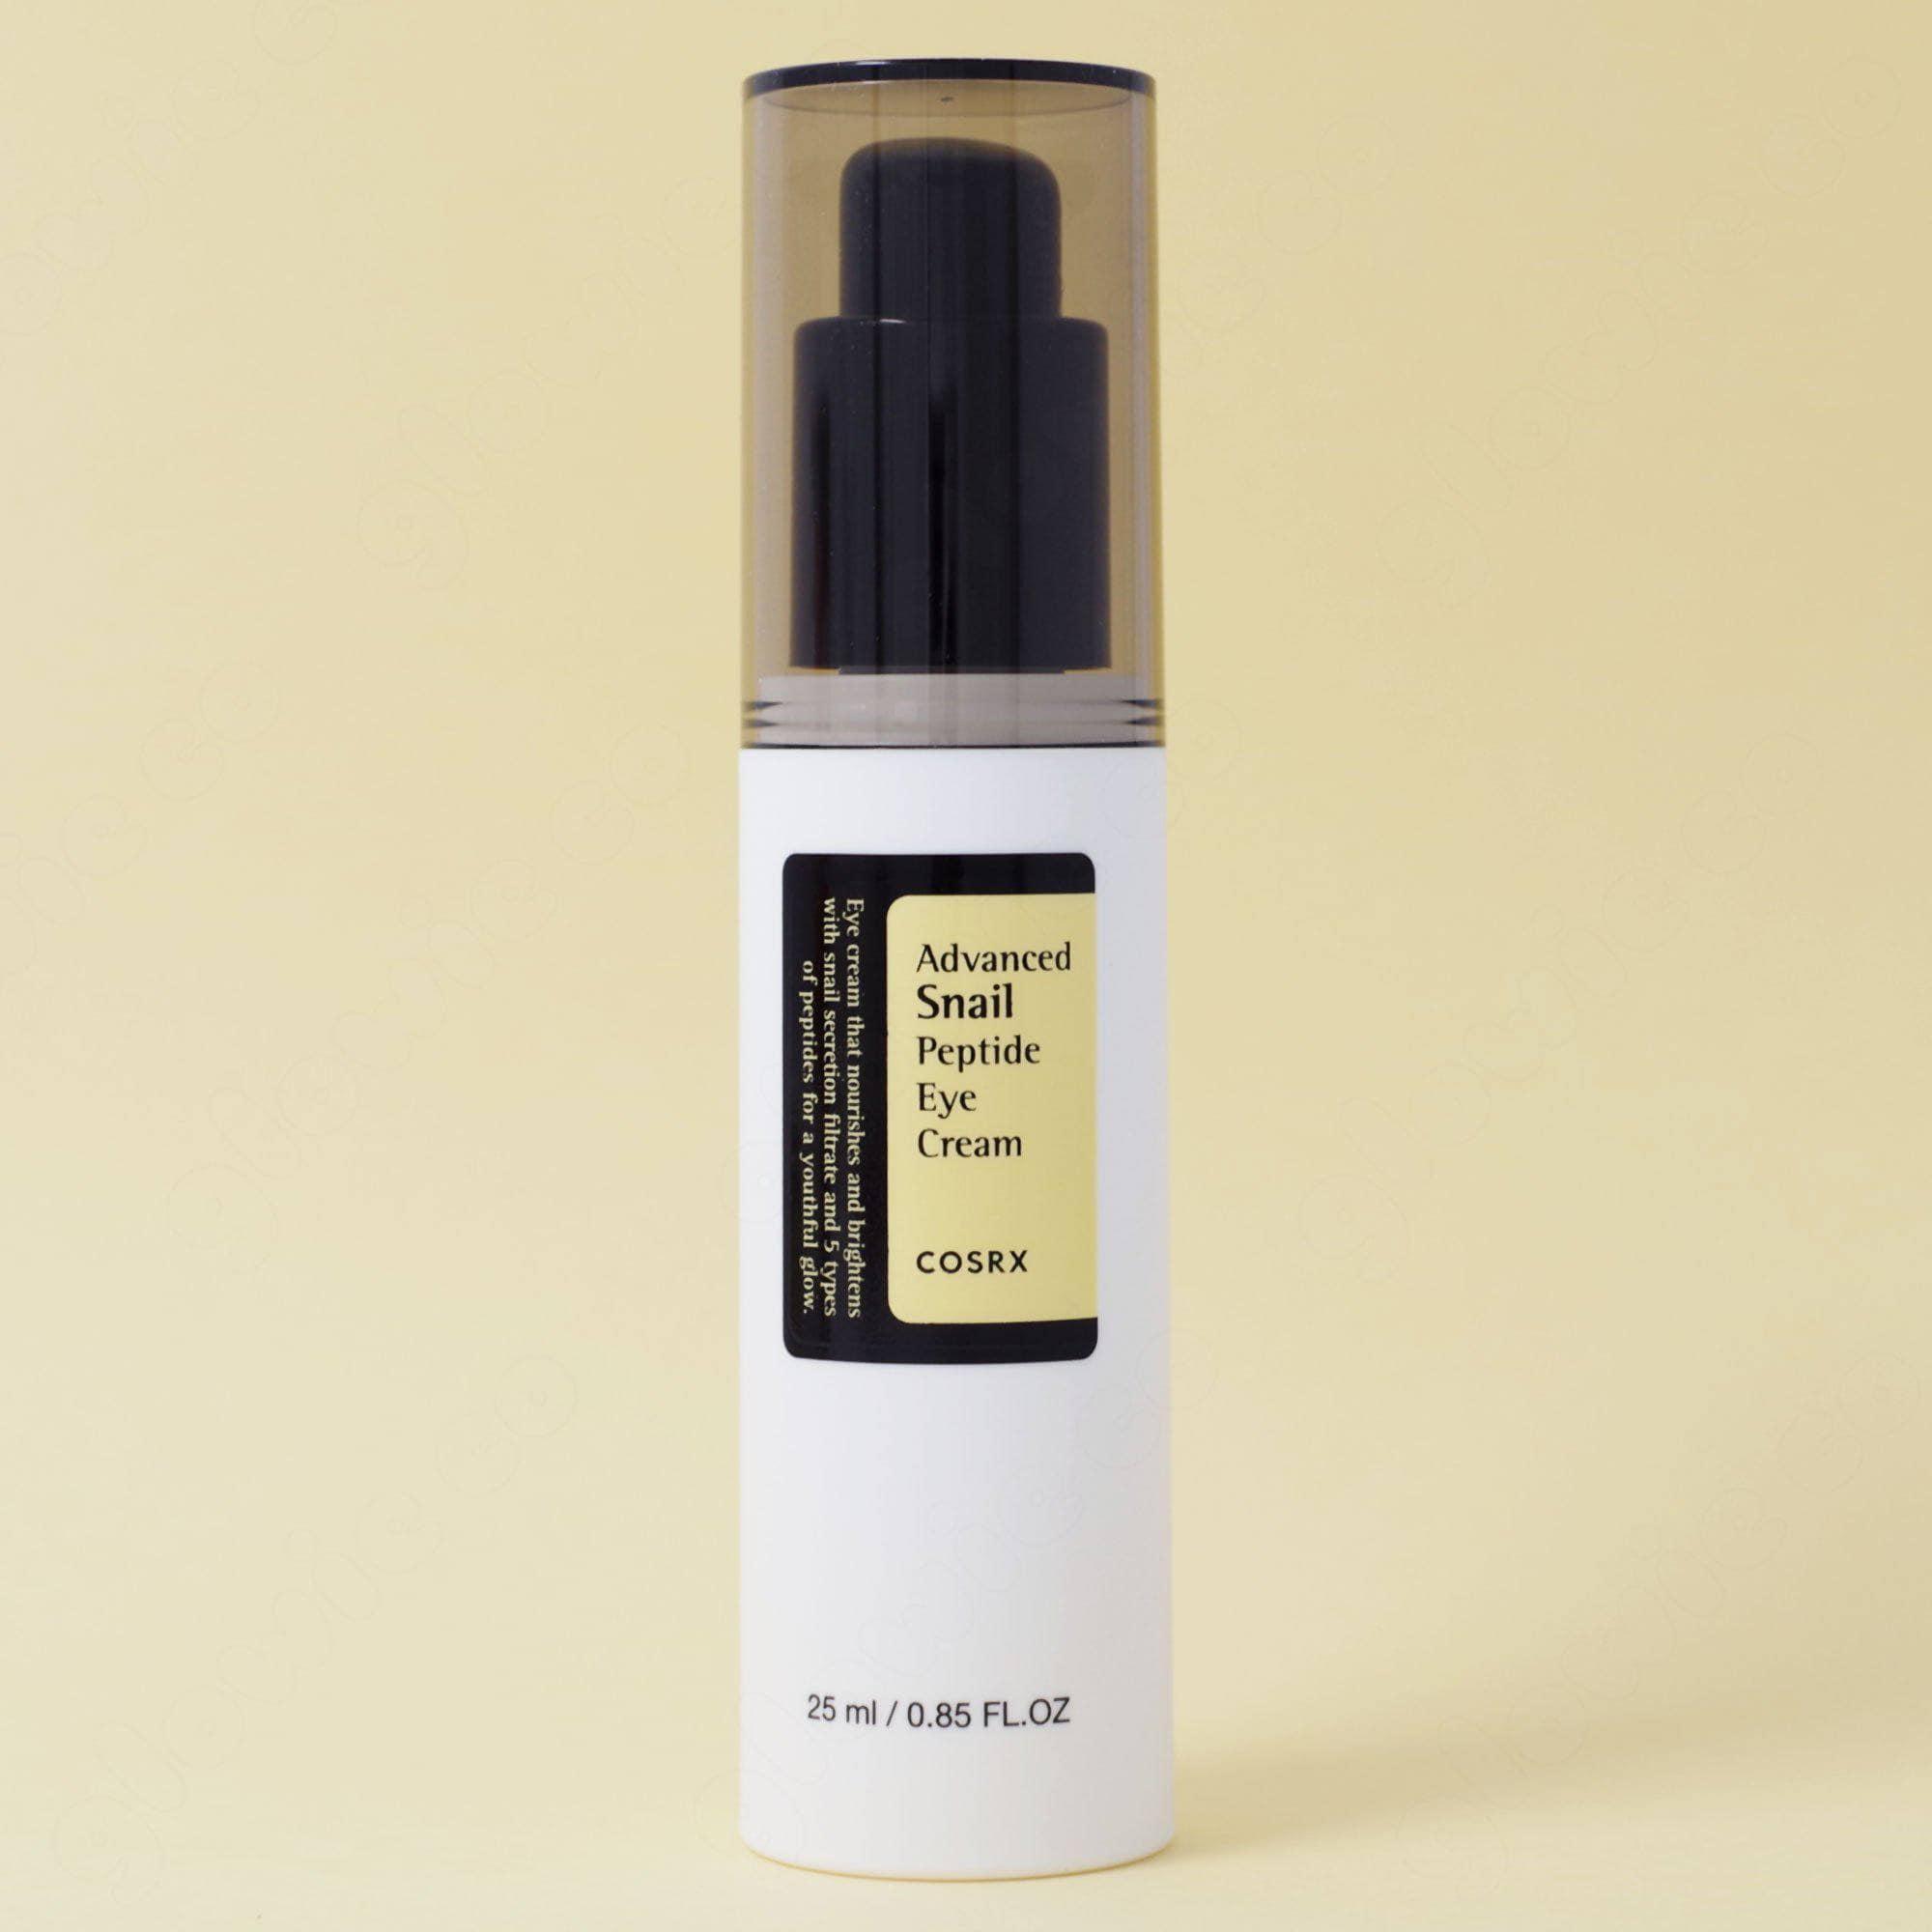 sản phẩm chăm sóc da Cosrx Advanced Snail Peptide Eye Cream